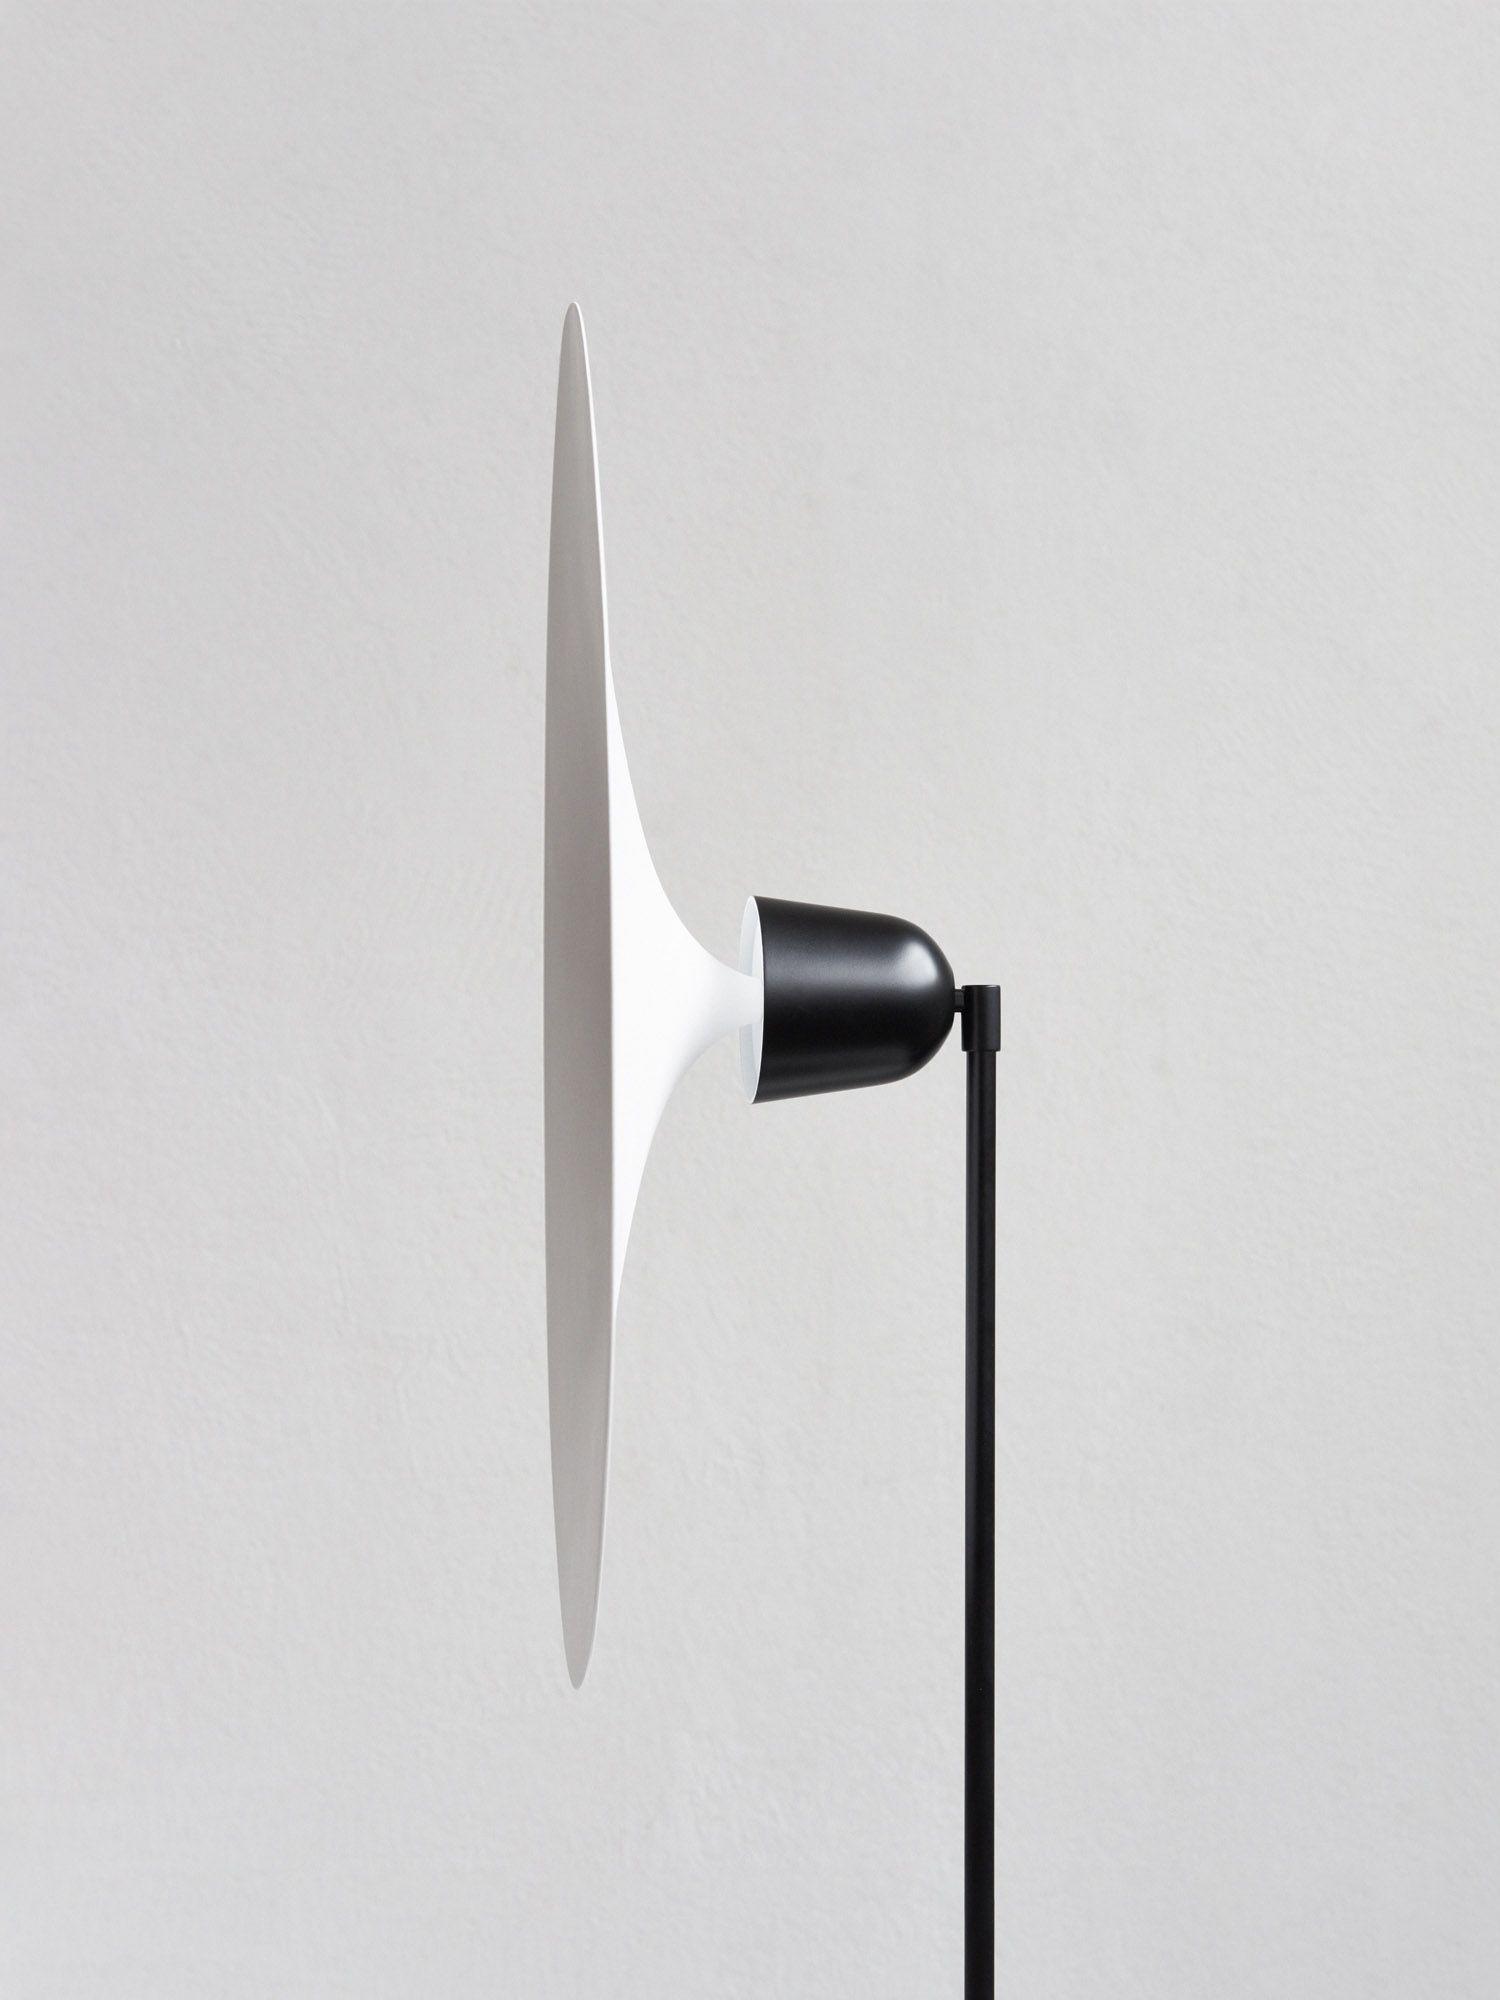 An exploration of light direction by Falke Svatun Studio